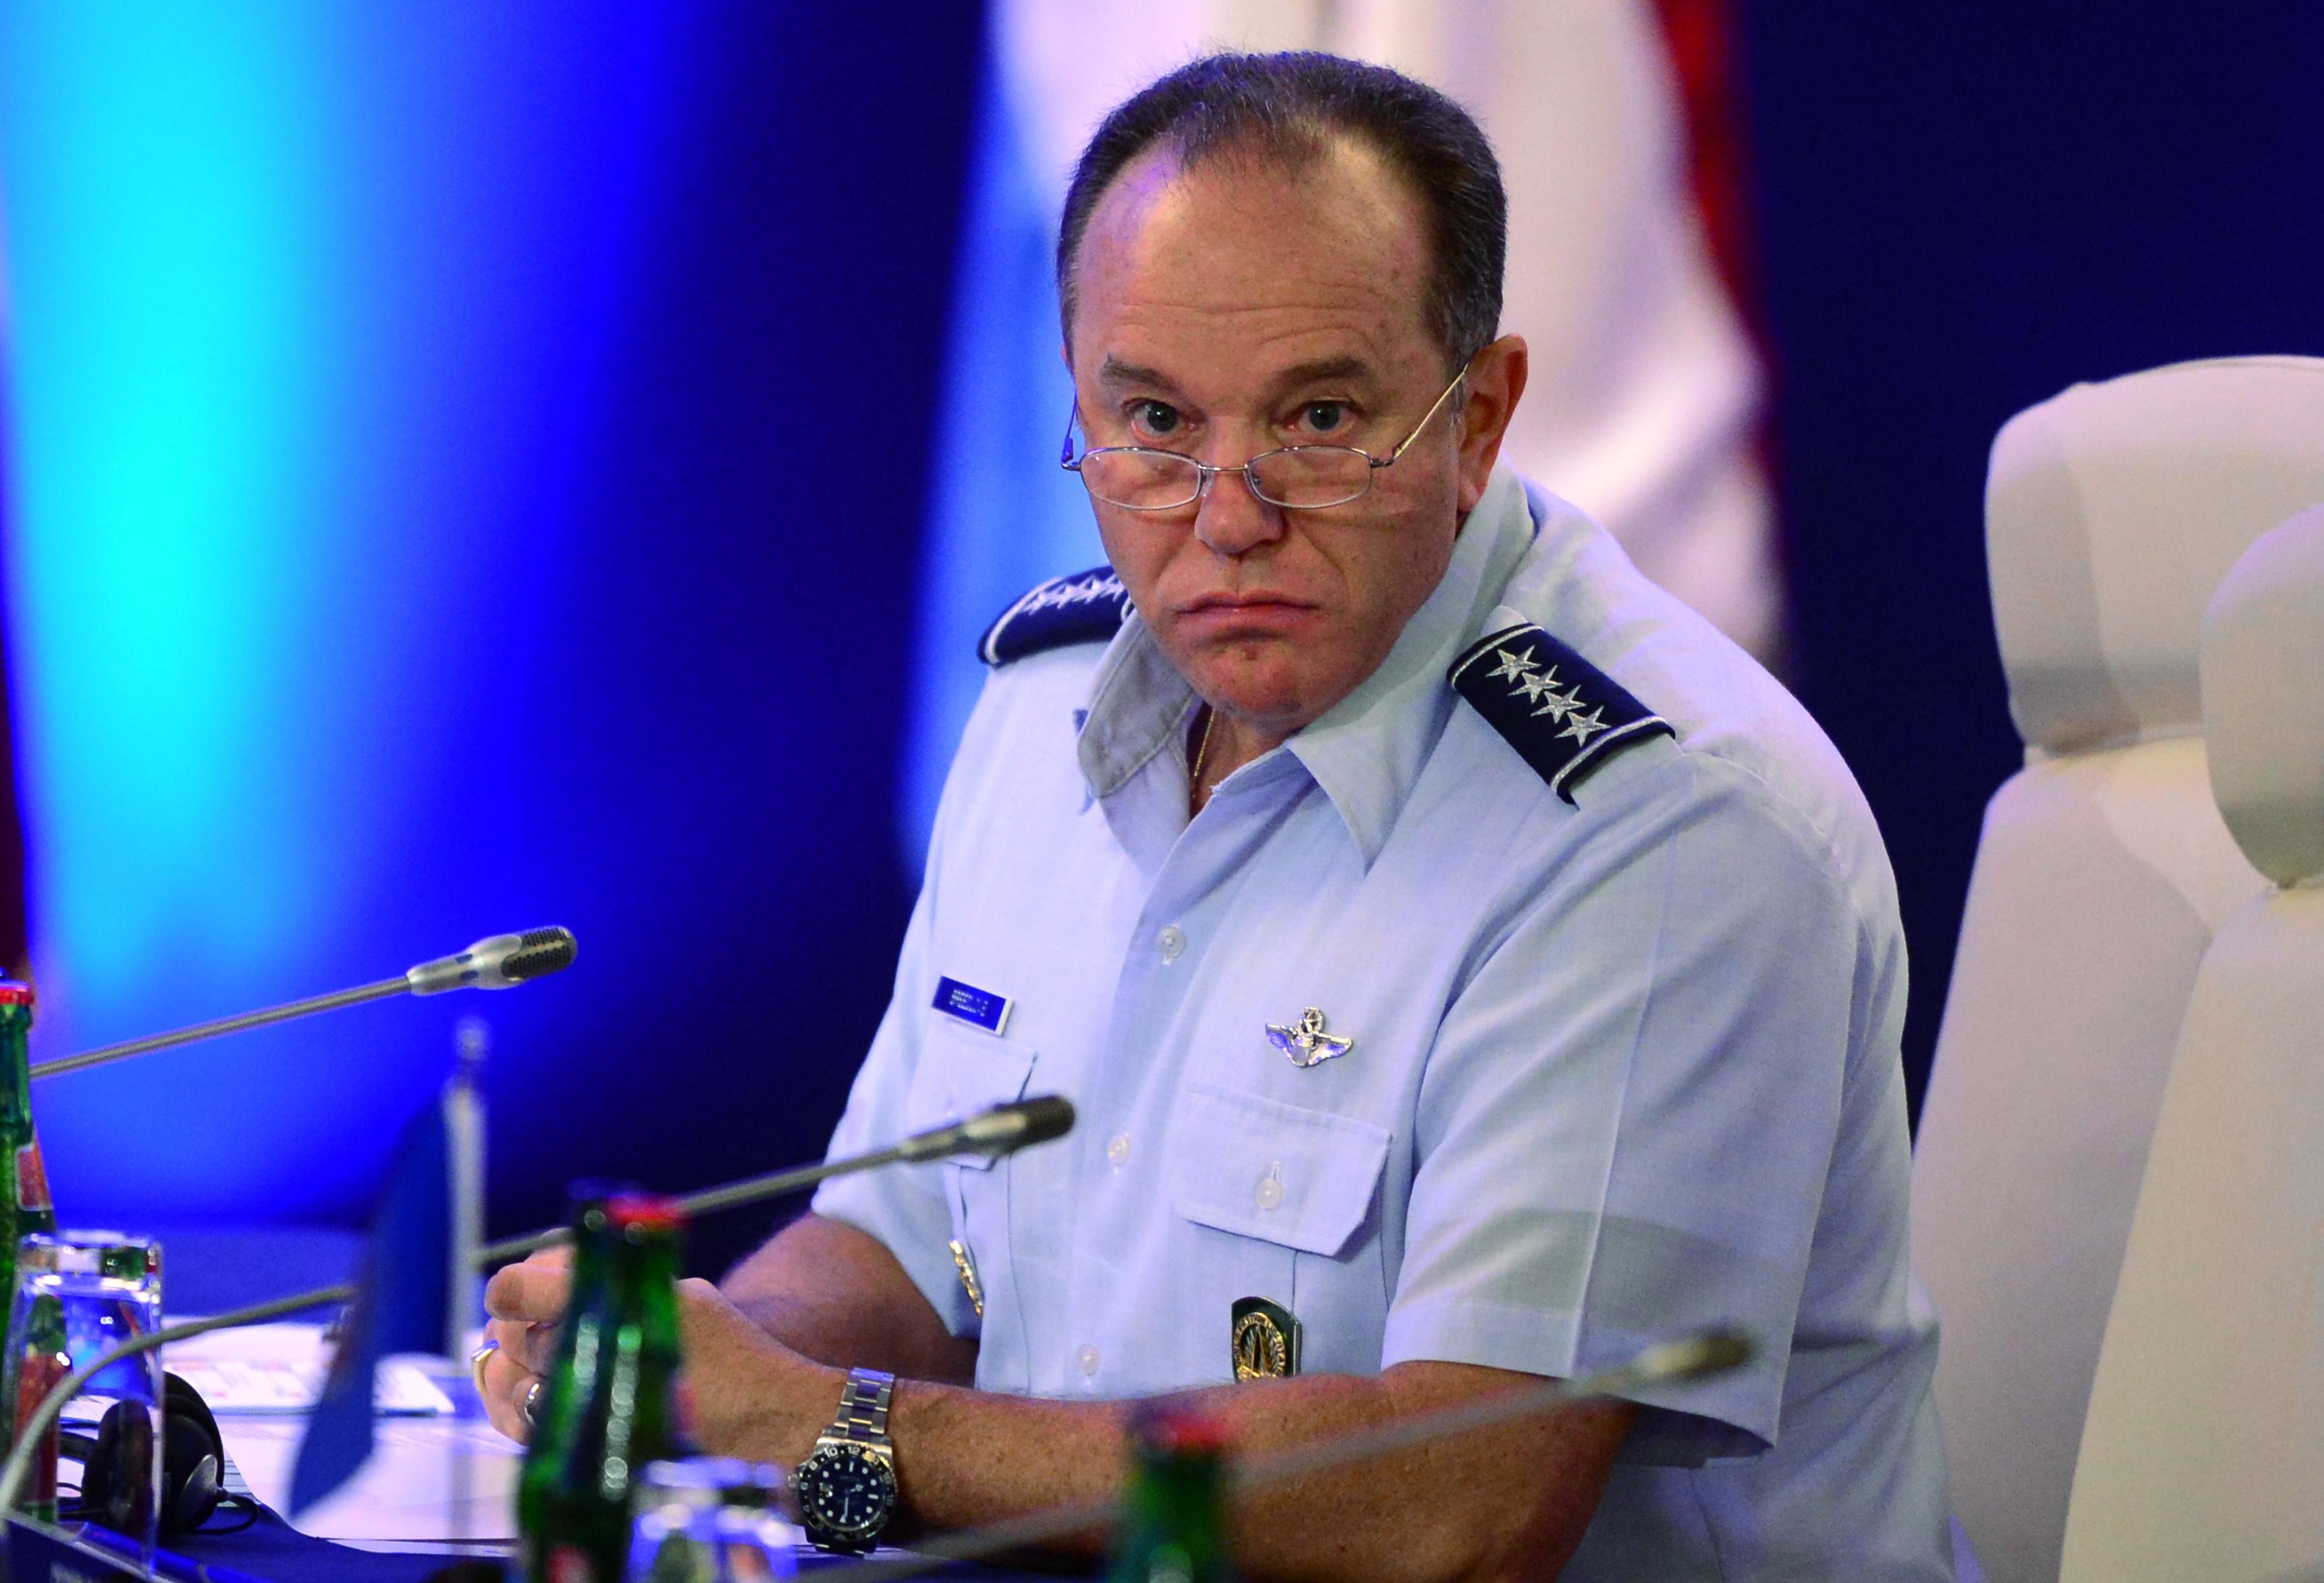 US General Philip Mark Breedlove